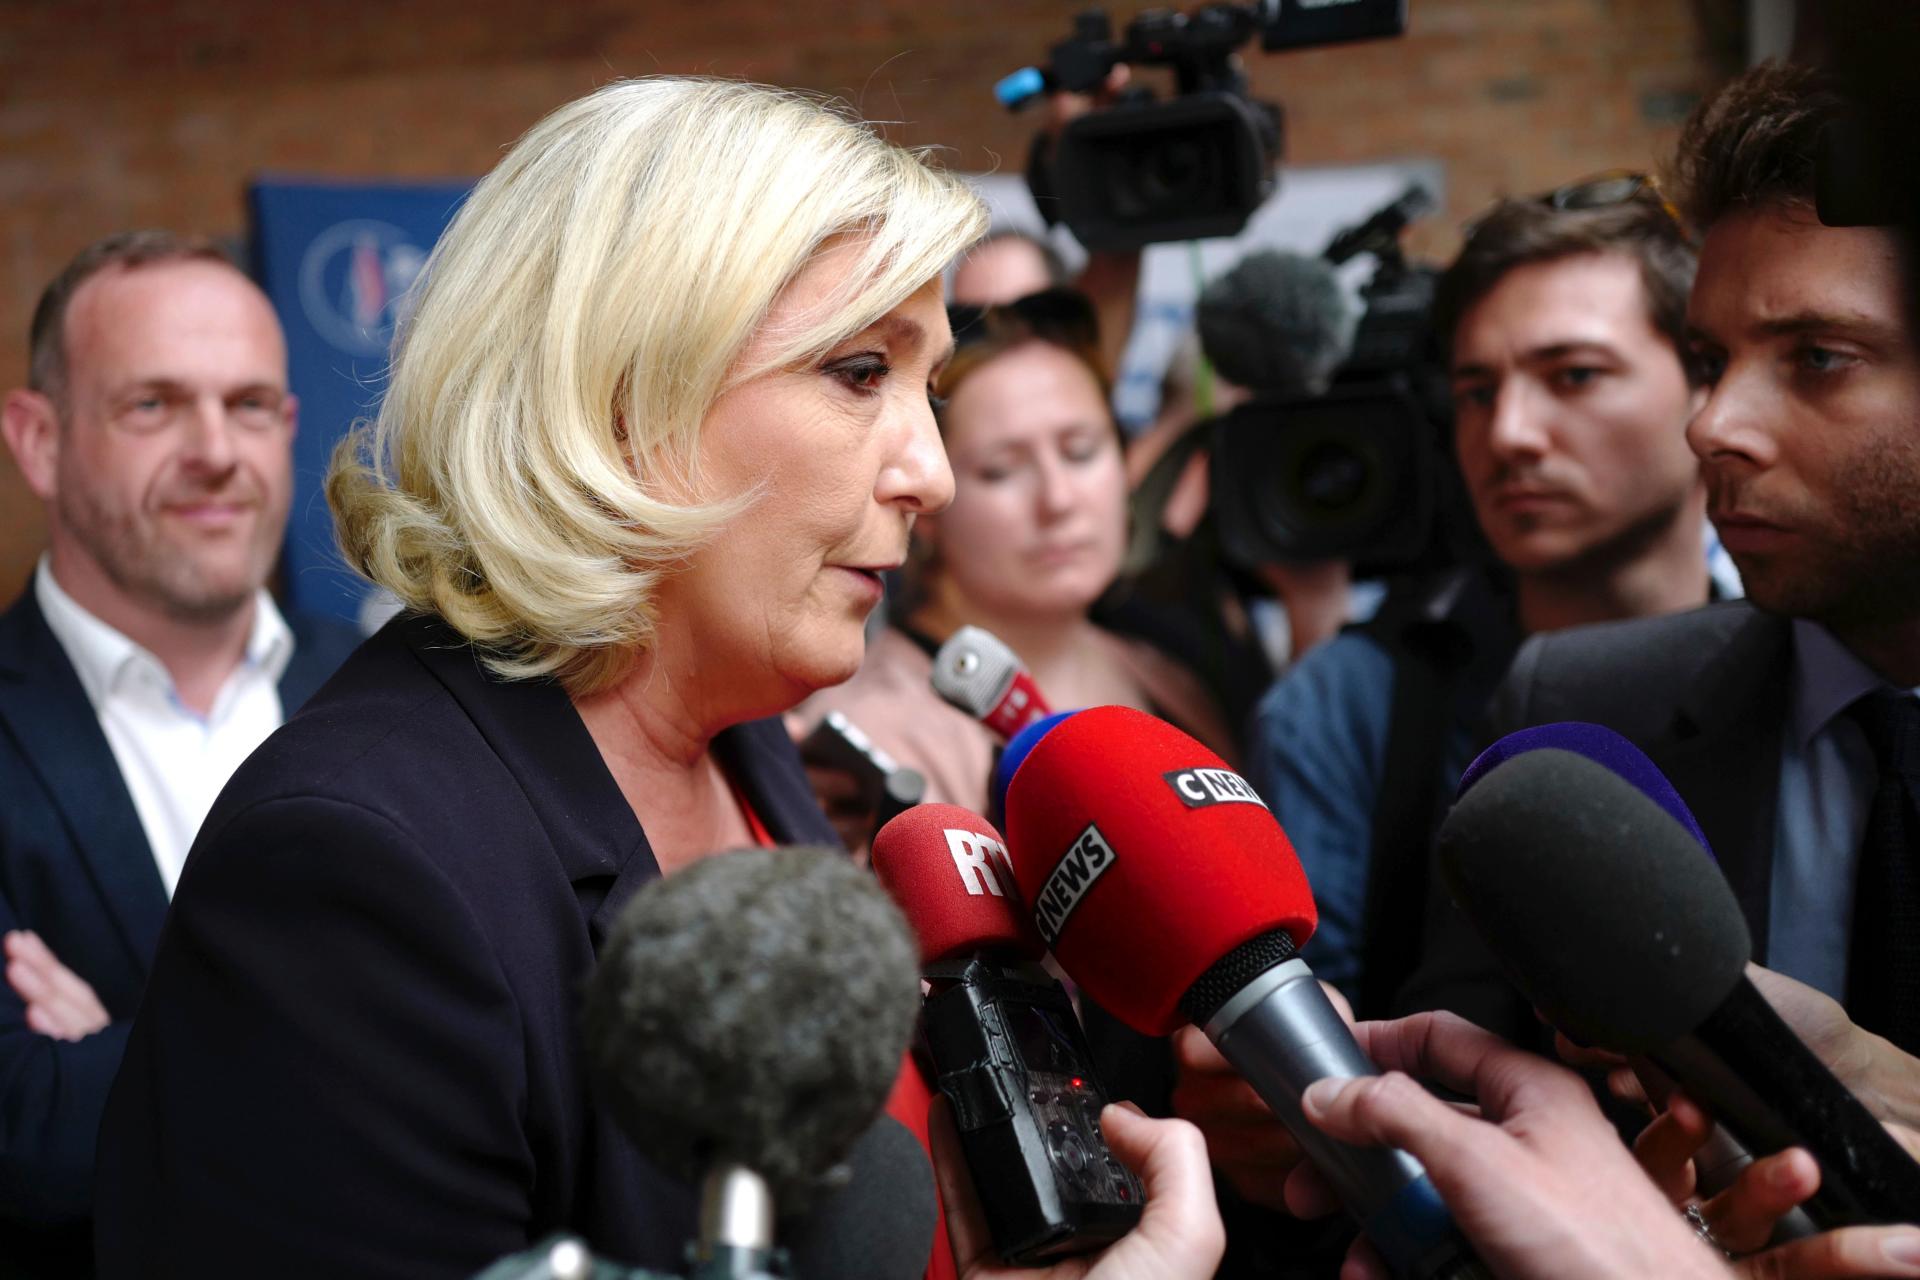 French far-right leader says EU vote a referendum on Macron